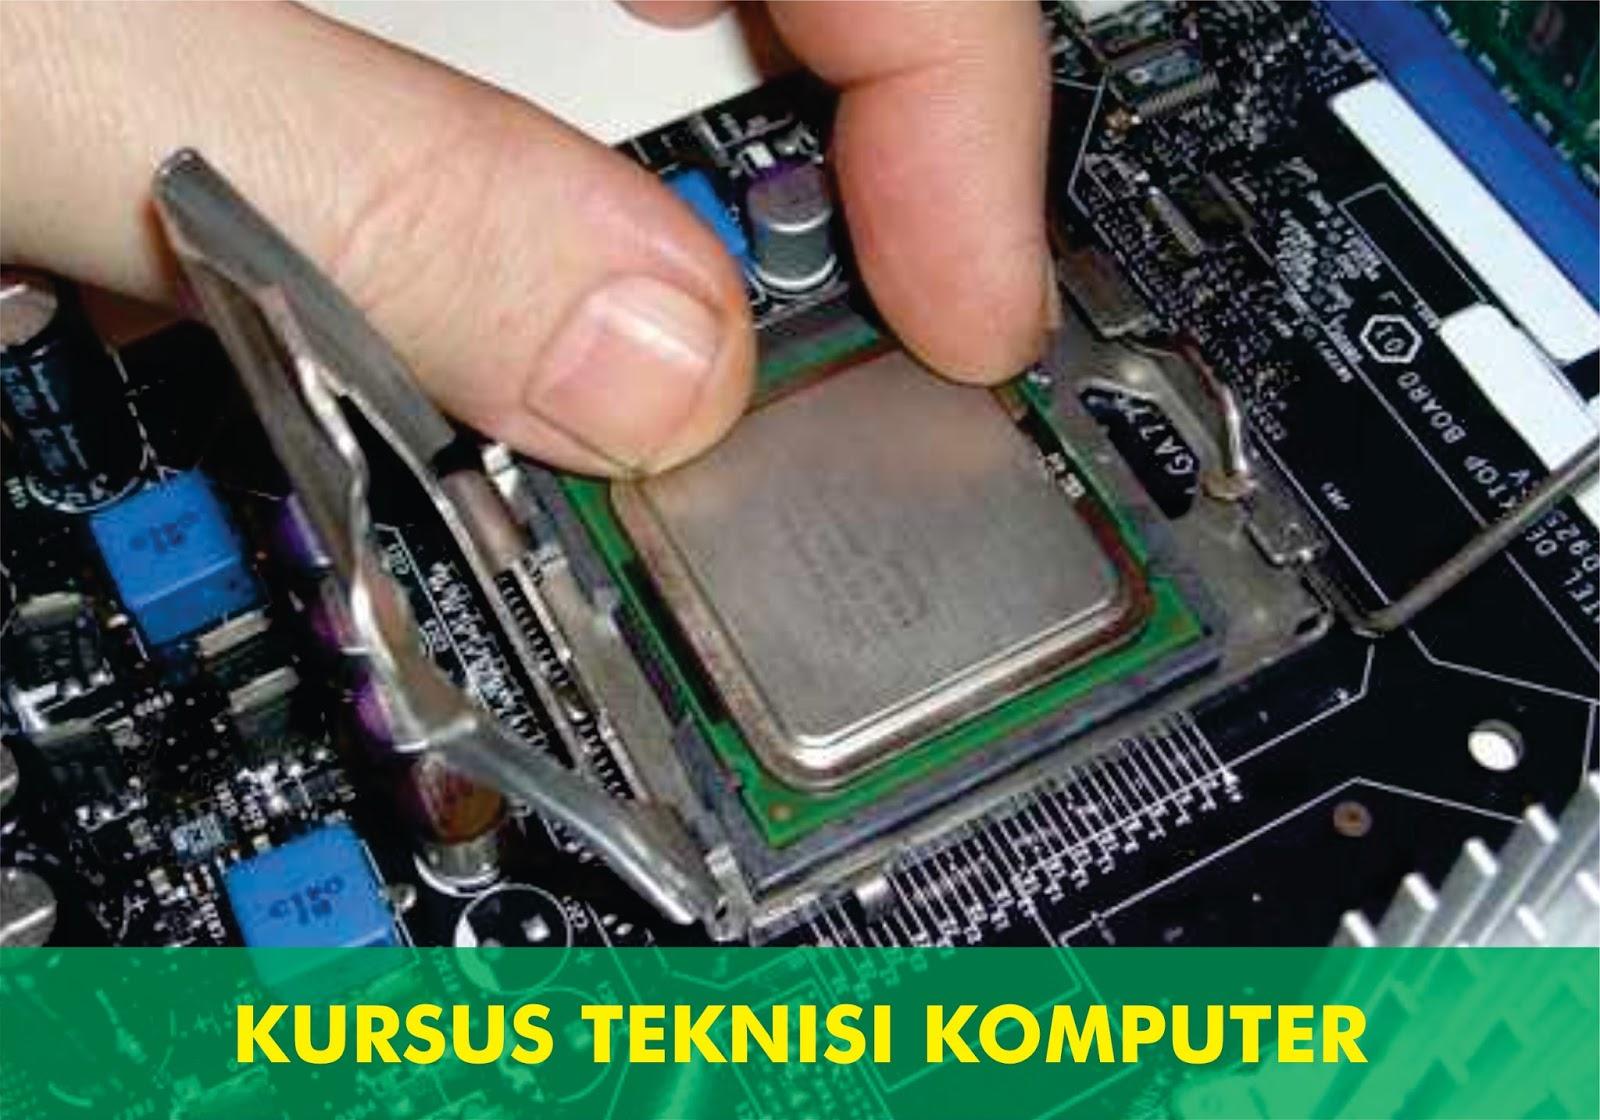 Hasil gambar untuk keunggulan kursus teknisi komputer